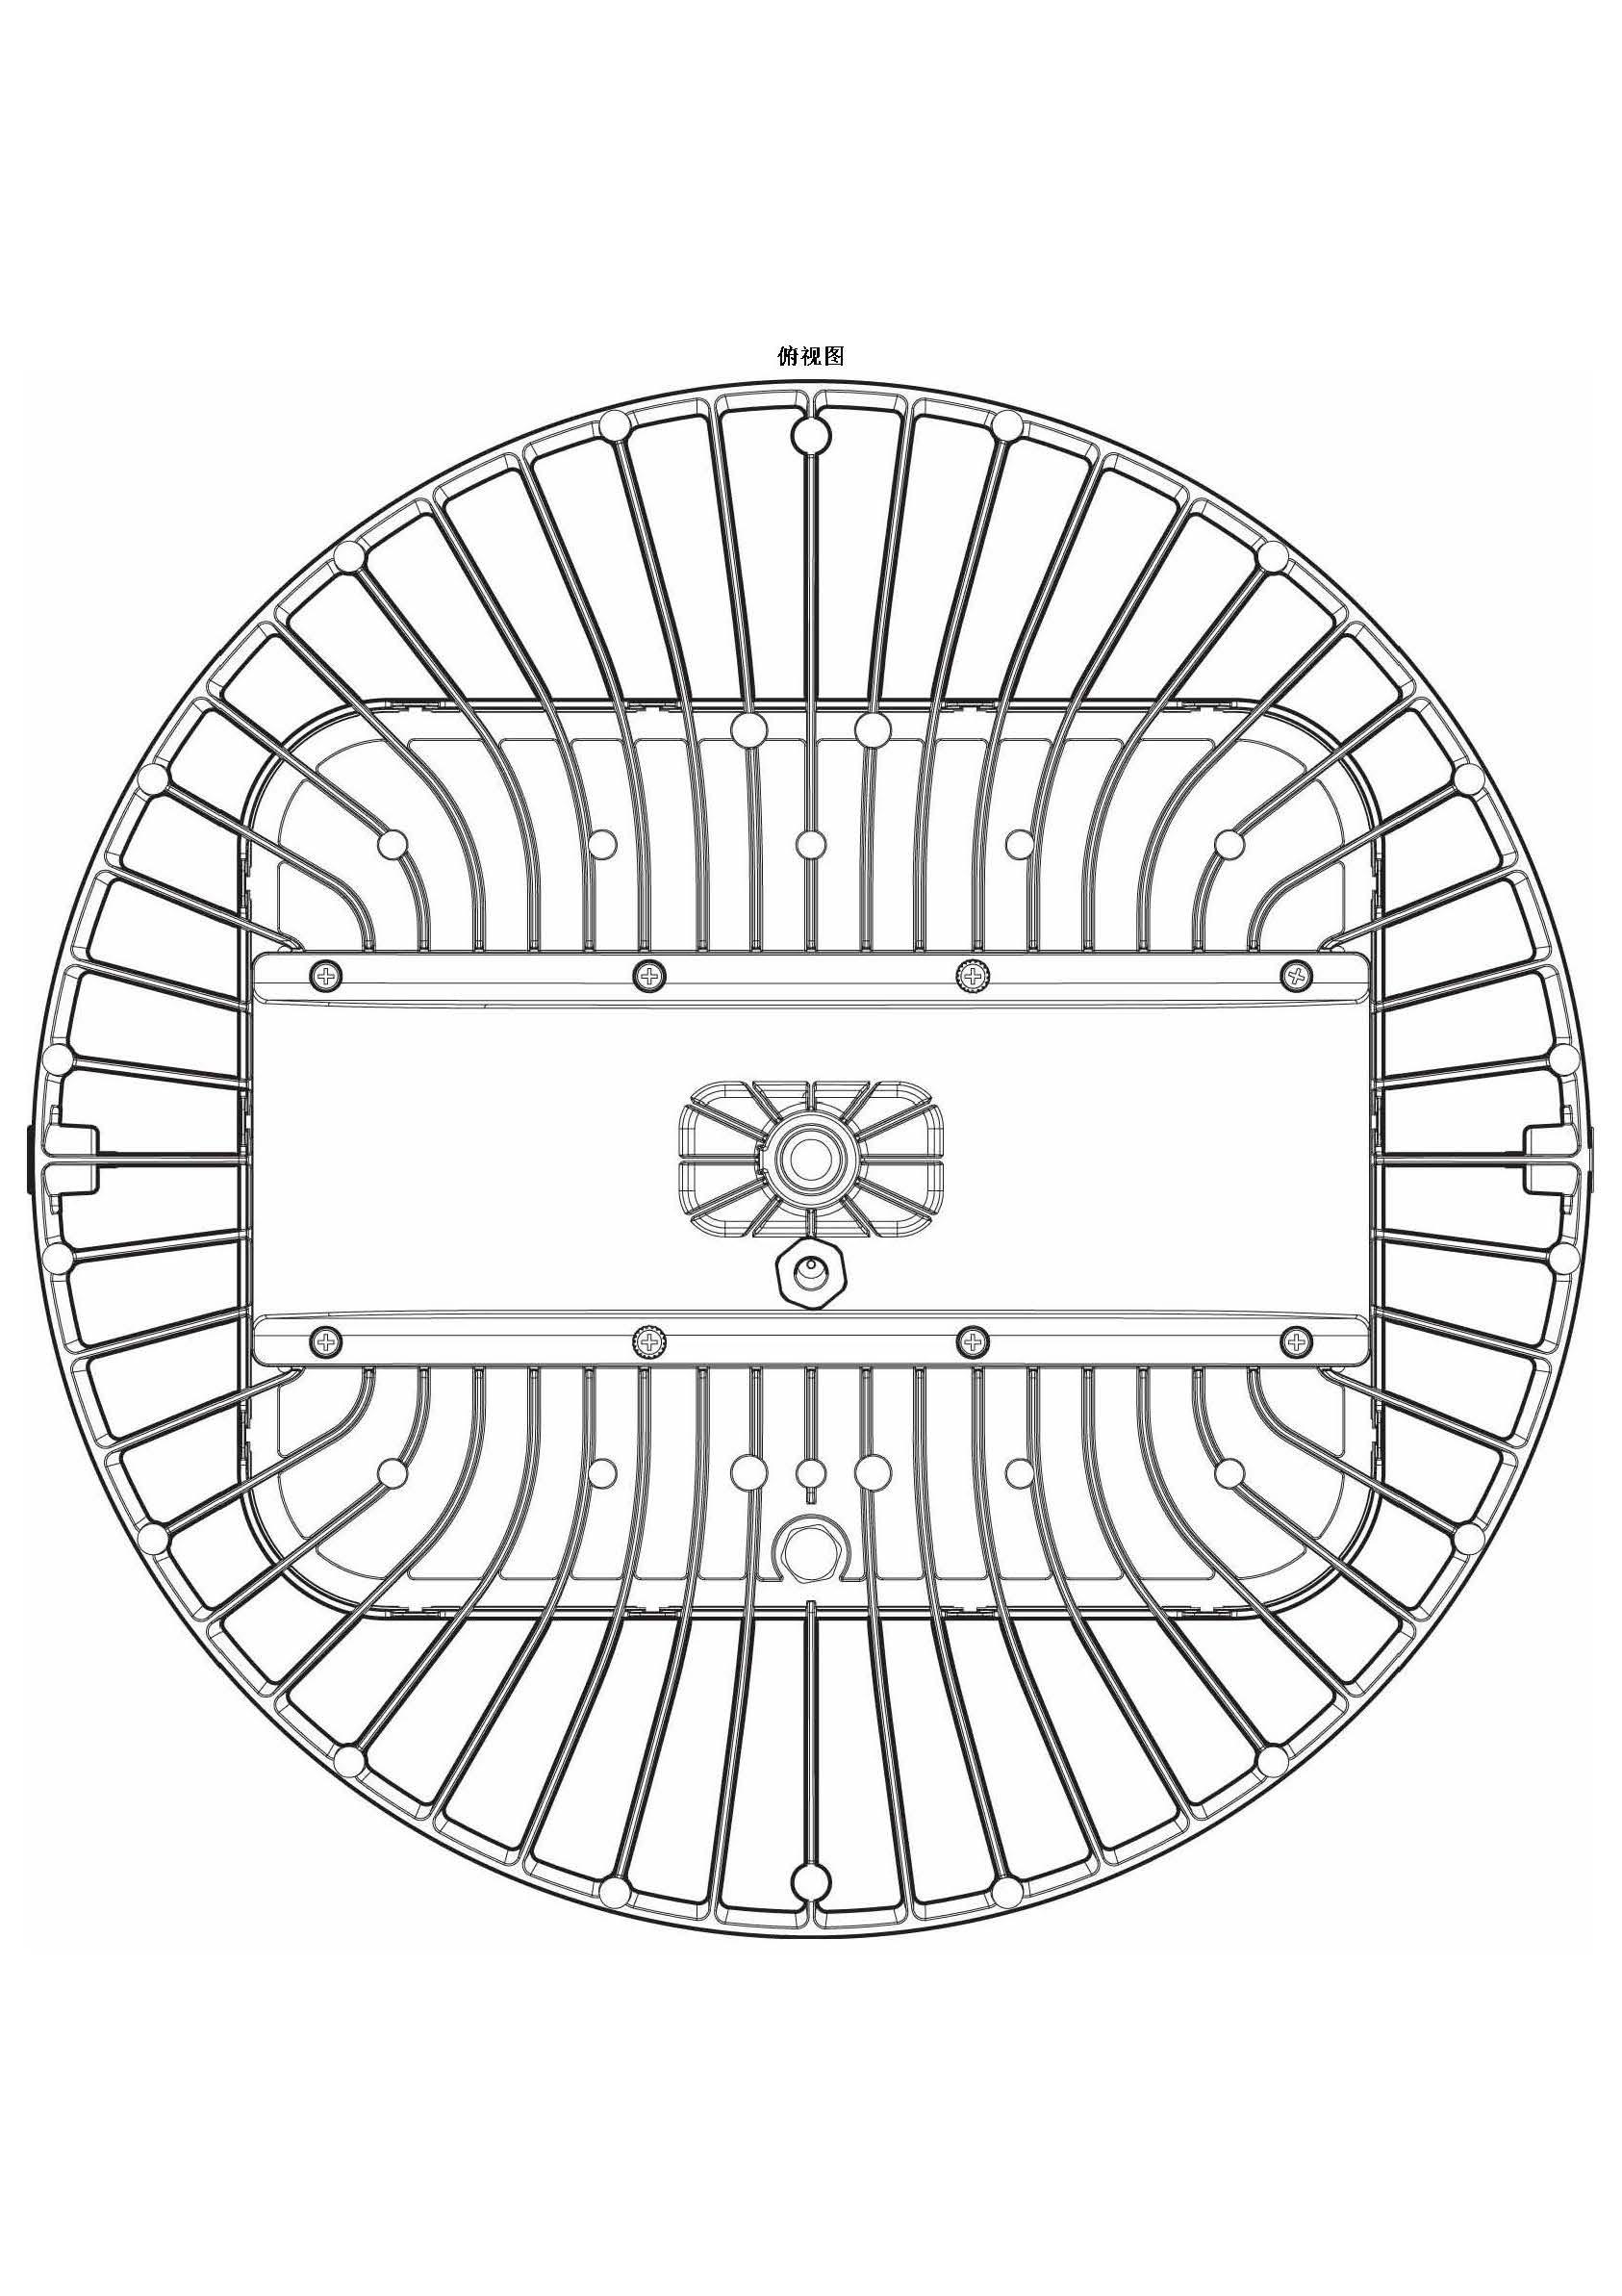 CN201630209928-LED高天棚燈-外觀專利_頁面_7.jpg